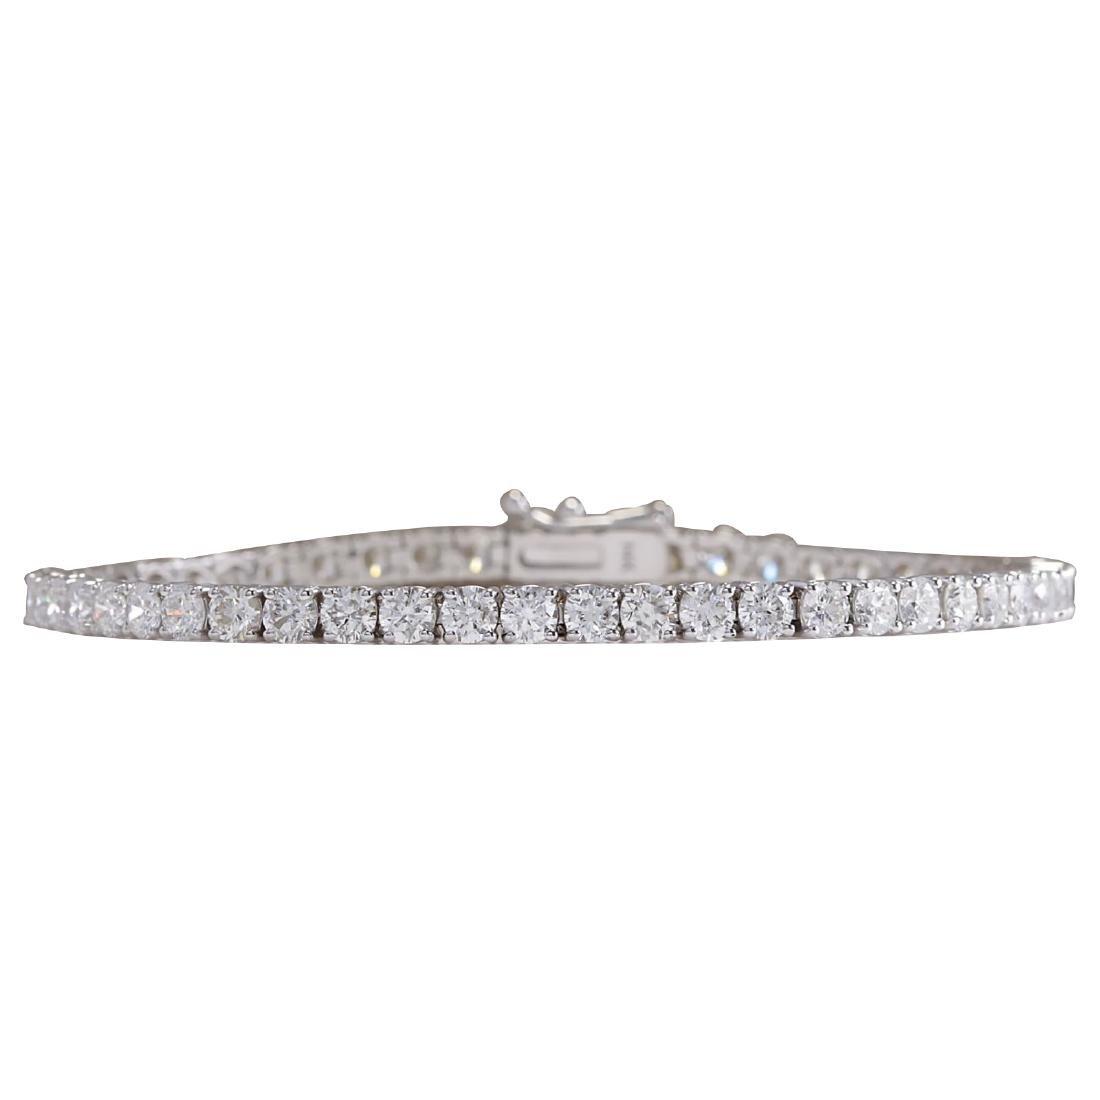 6.66CTW Natural Diamond Bracelet In 18K Solid White